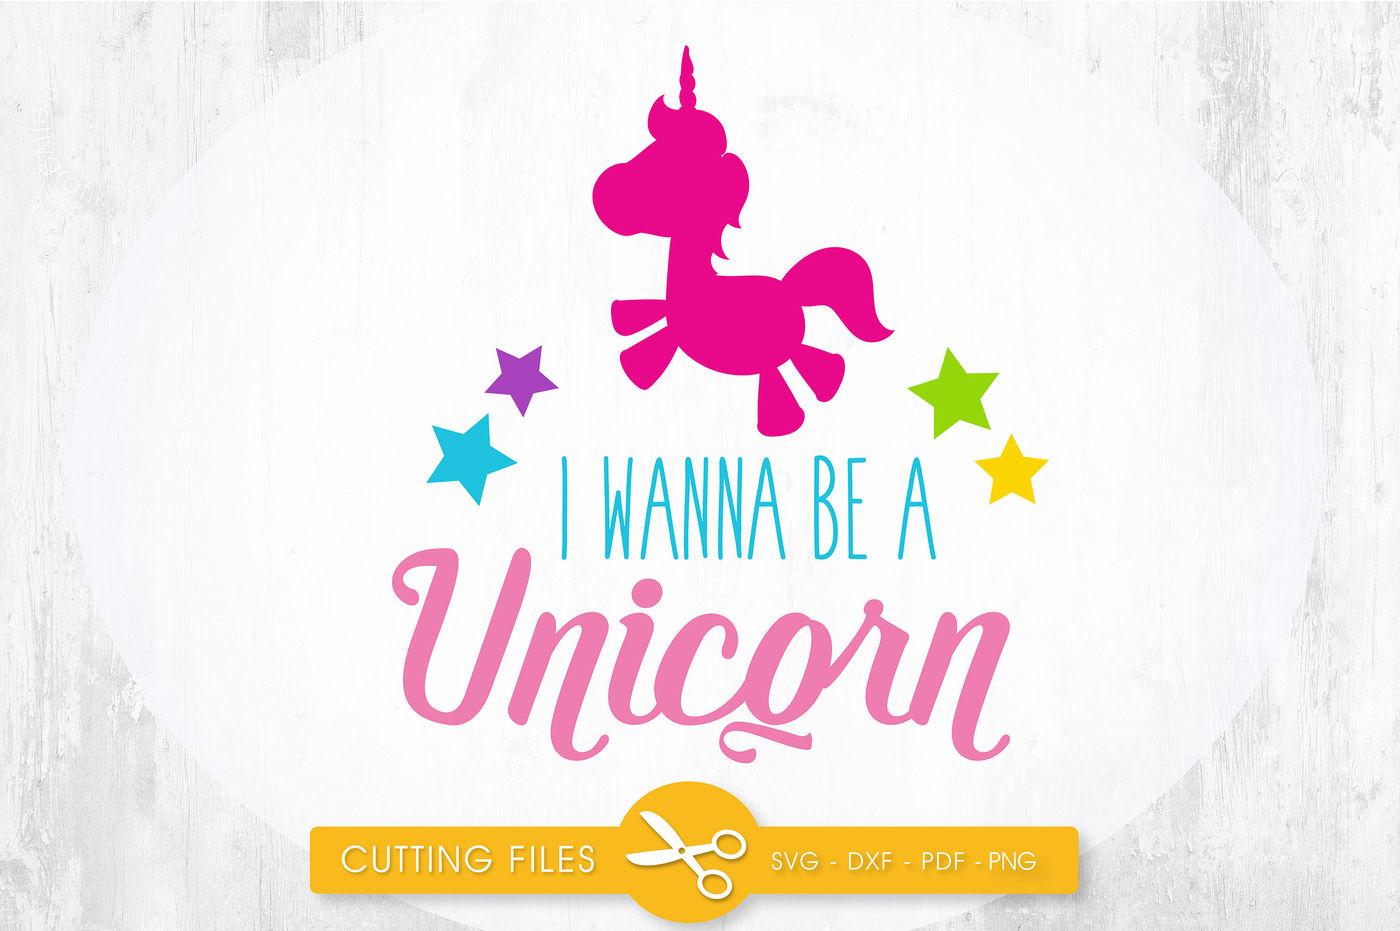 I Wanna Be A Unicorn Svg Png Eps Dxf Cut File By